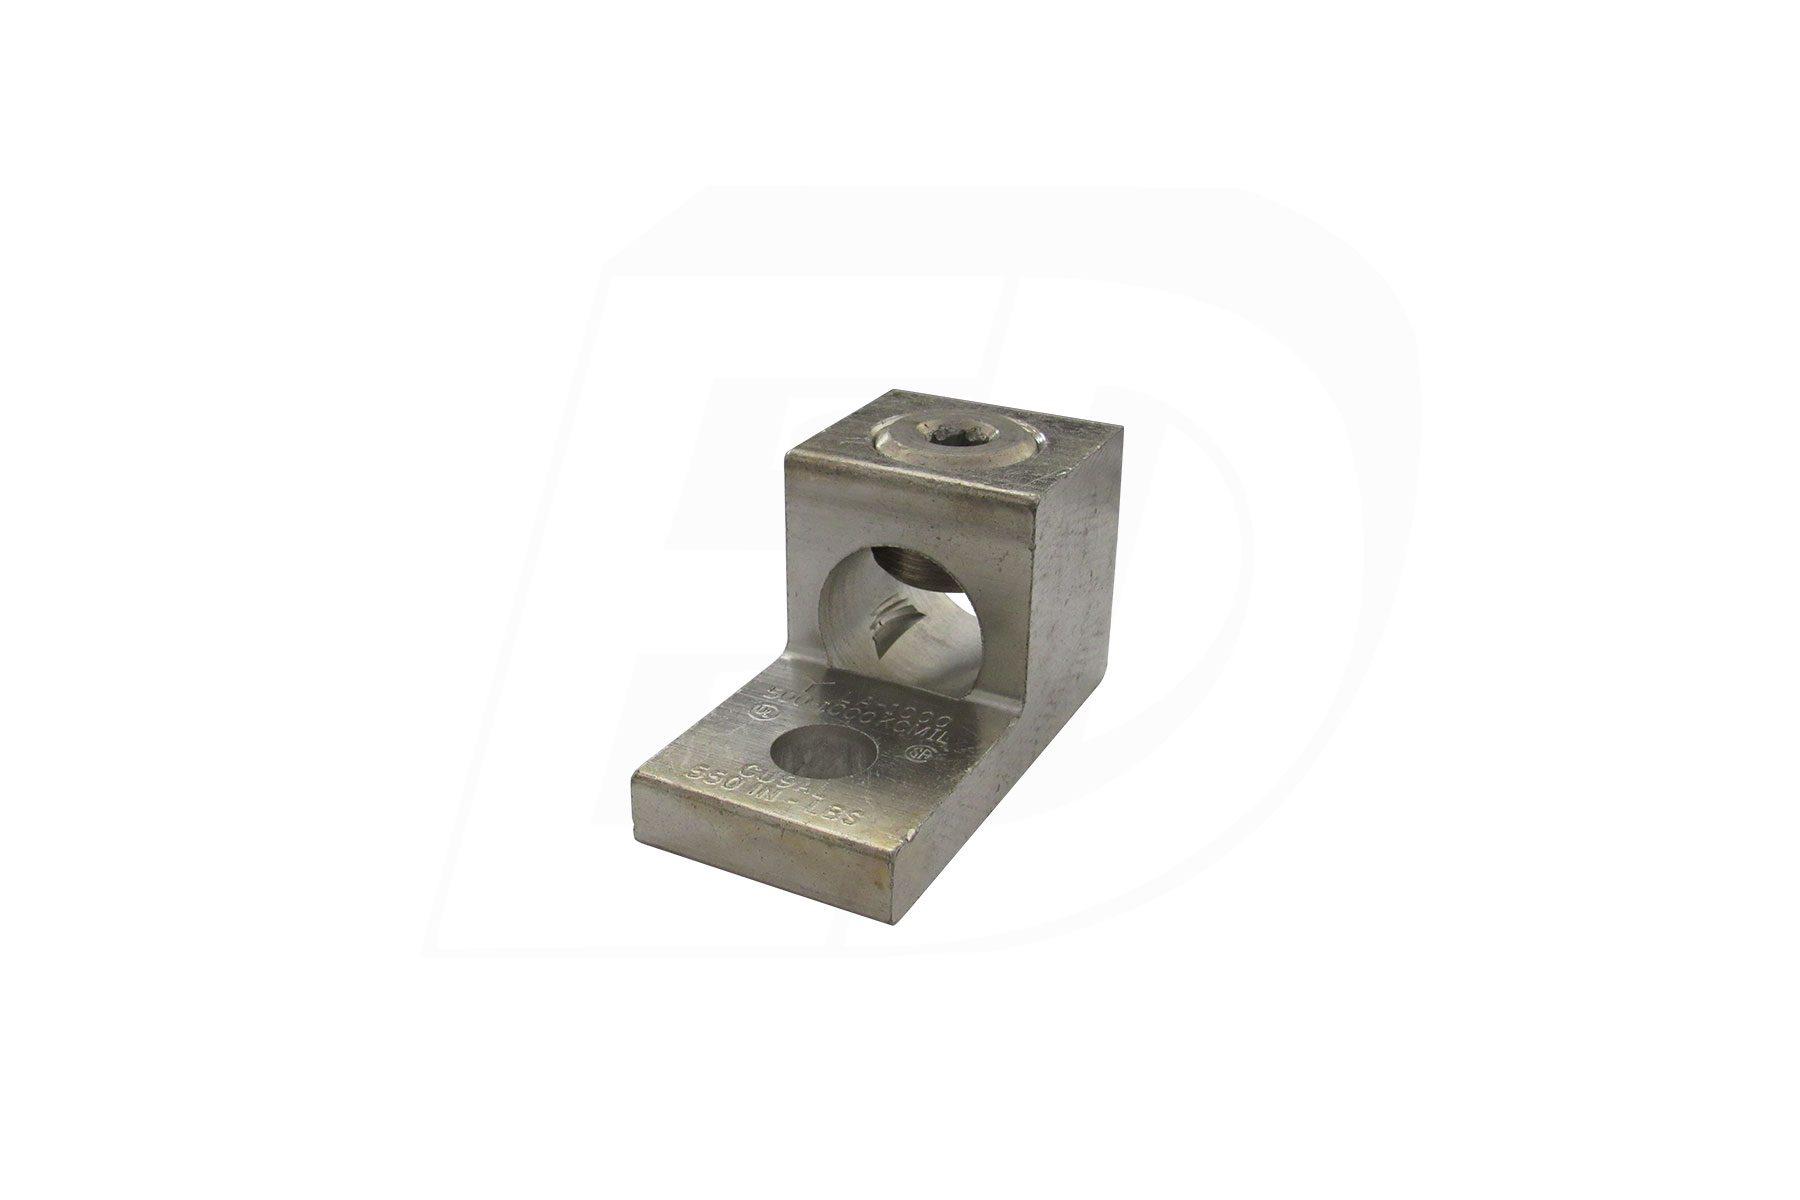 1 Hole Solderless Aluminum Mechanical Lug